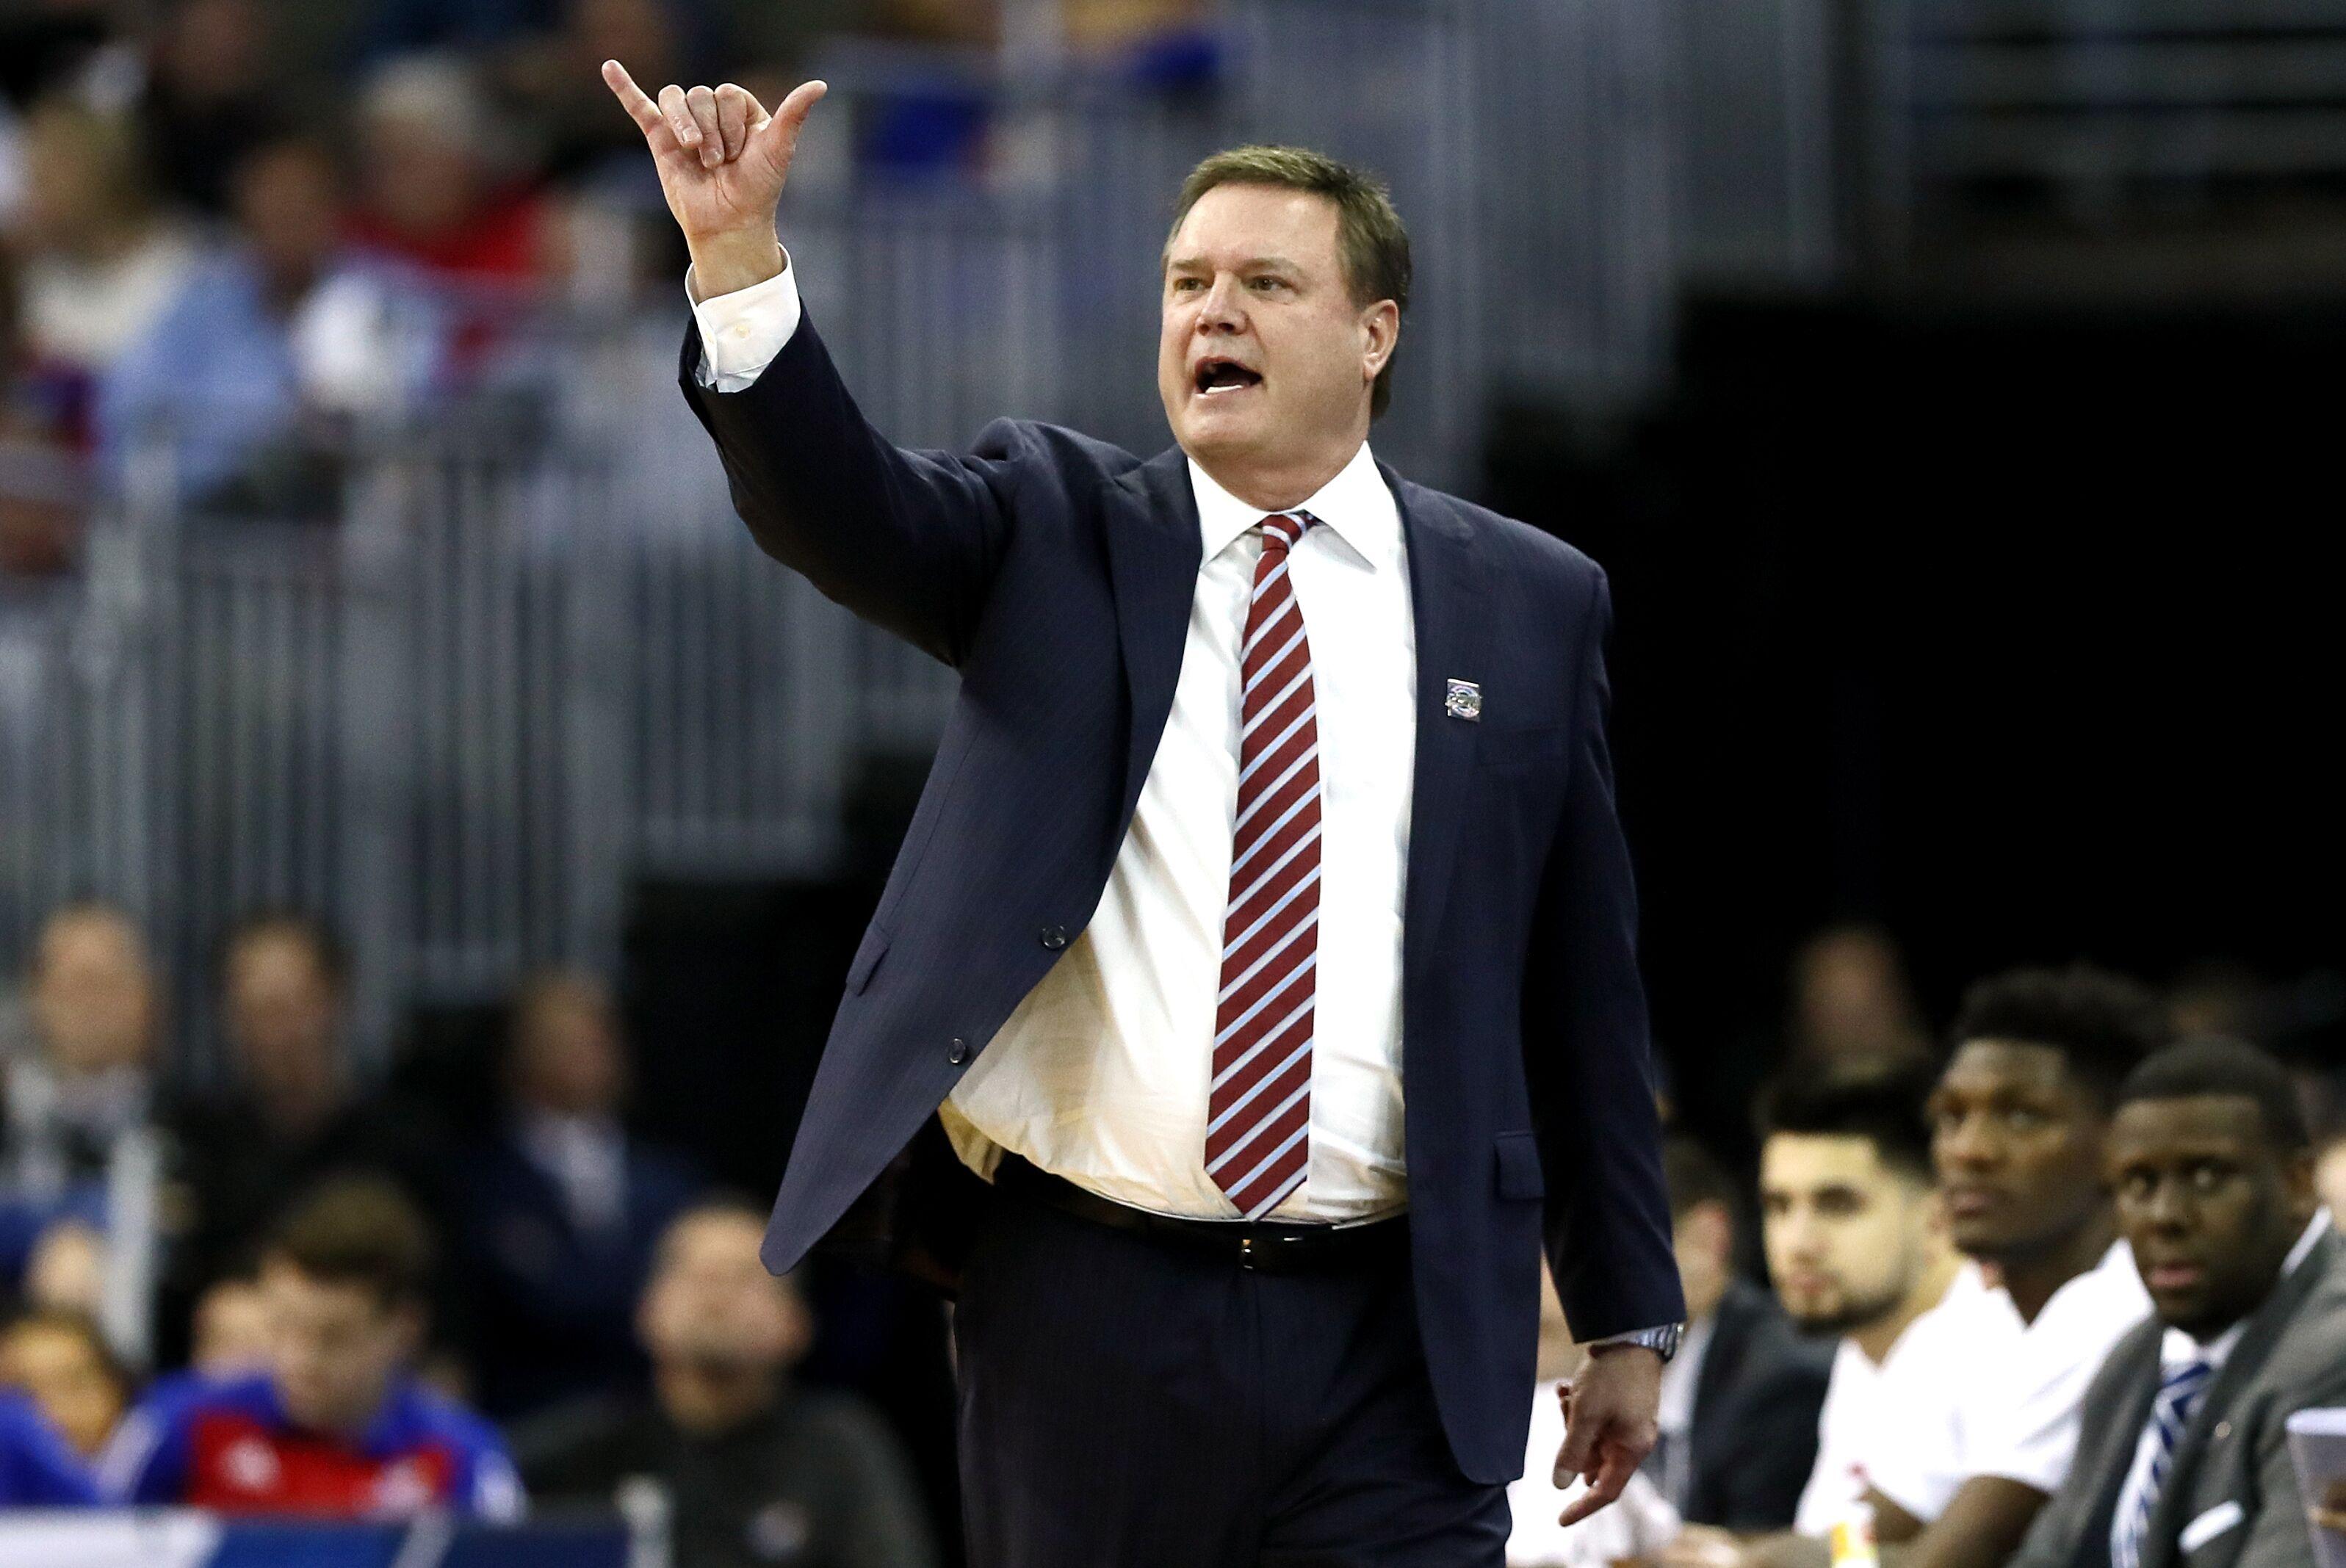 Kansas Basketball: 5 reasons Jayhawks will win Big 12 title in 2019-20